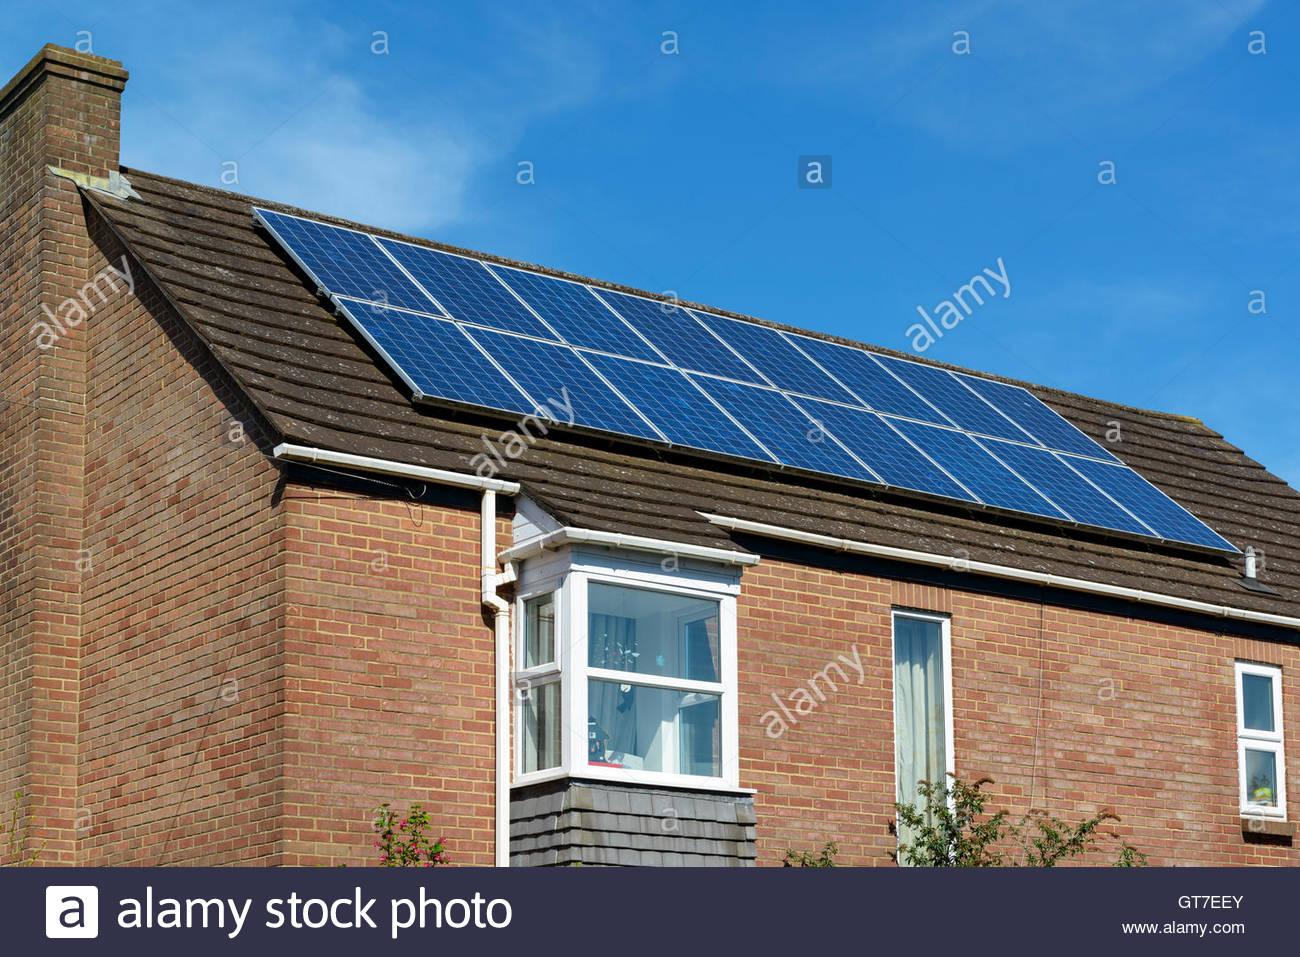 Solar panels on house roof, Salisbury, Wiltshire, England UK - Stock Image